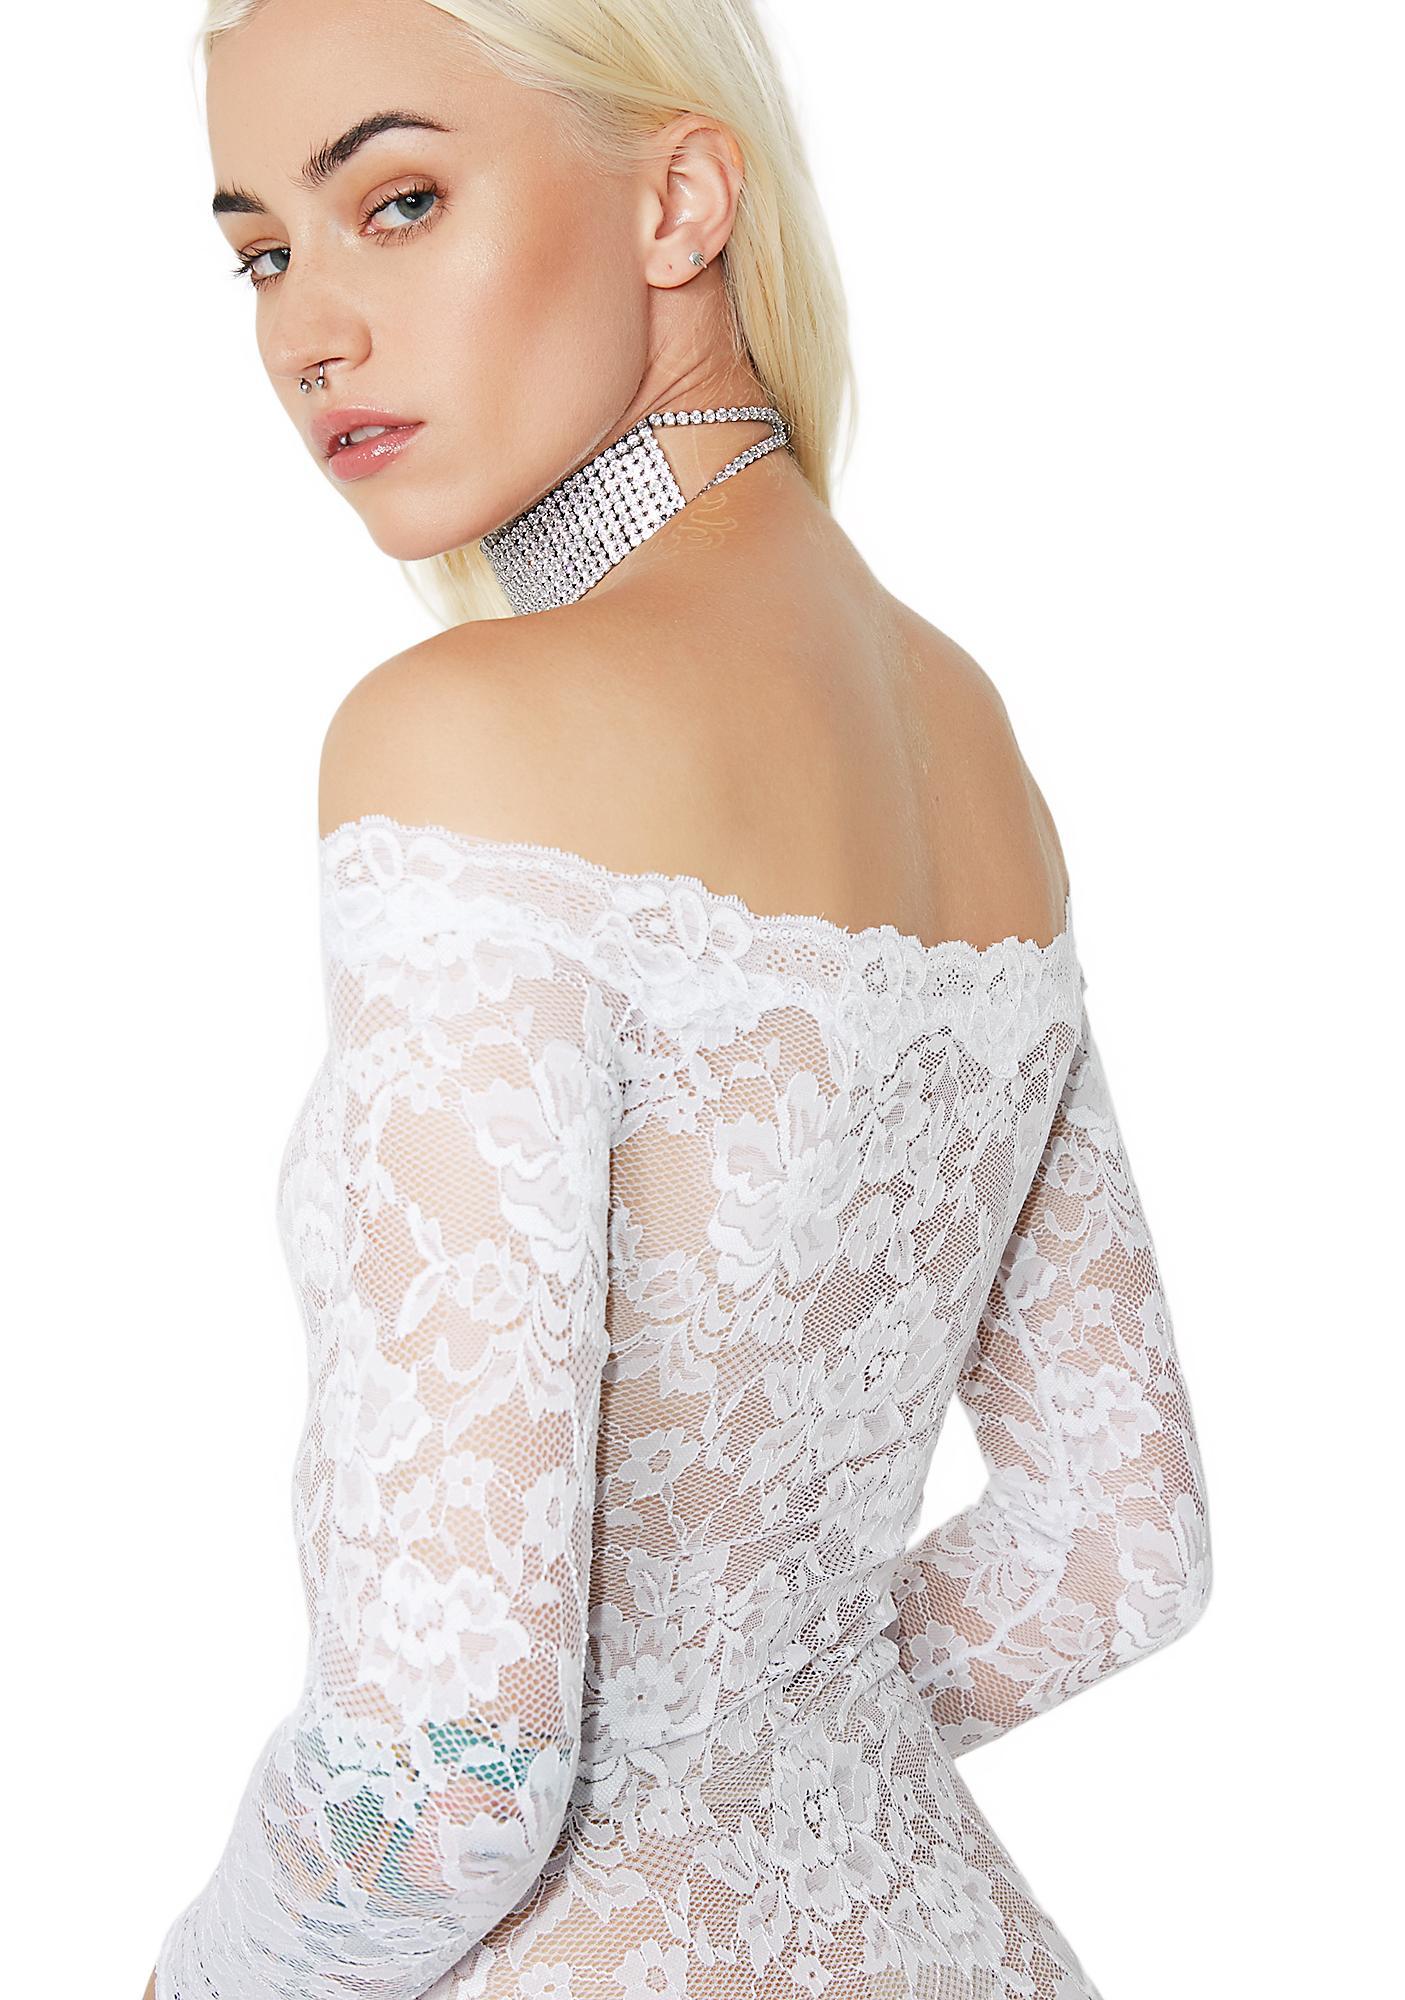 Picture Perf Floral Lace Bodysuit